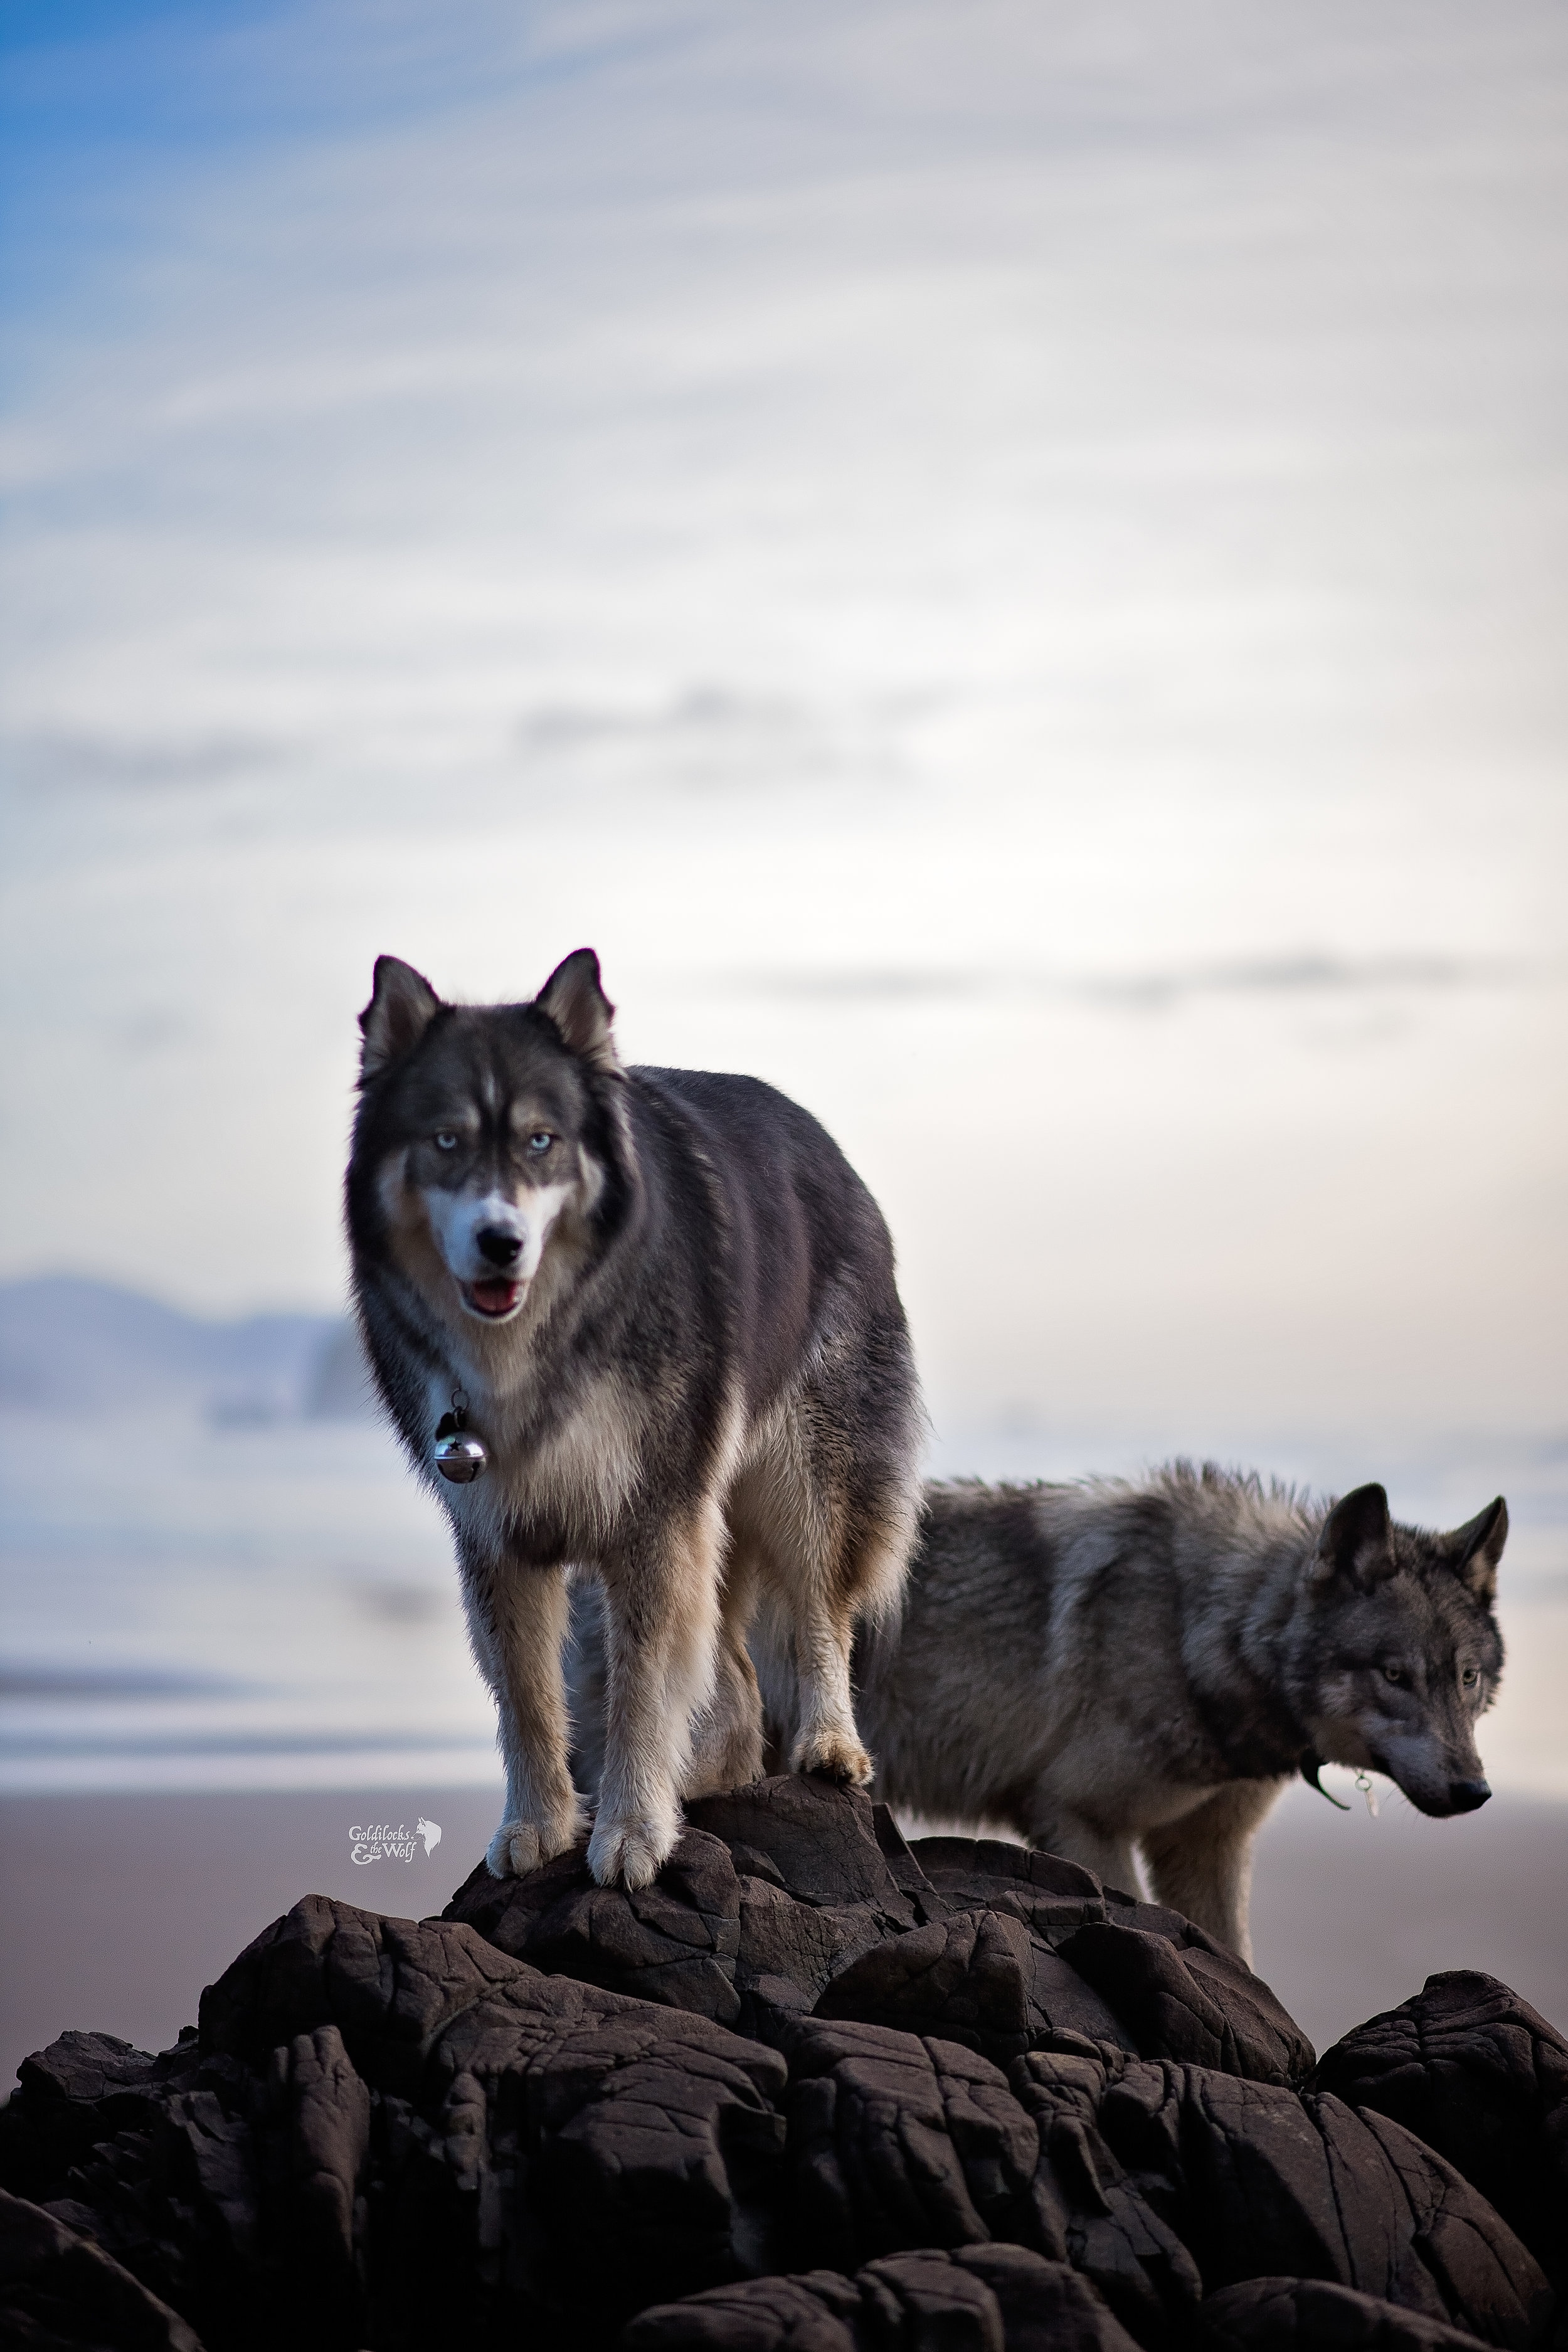 Kyro the husky and Ivar the Wolfdog